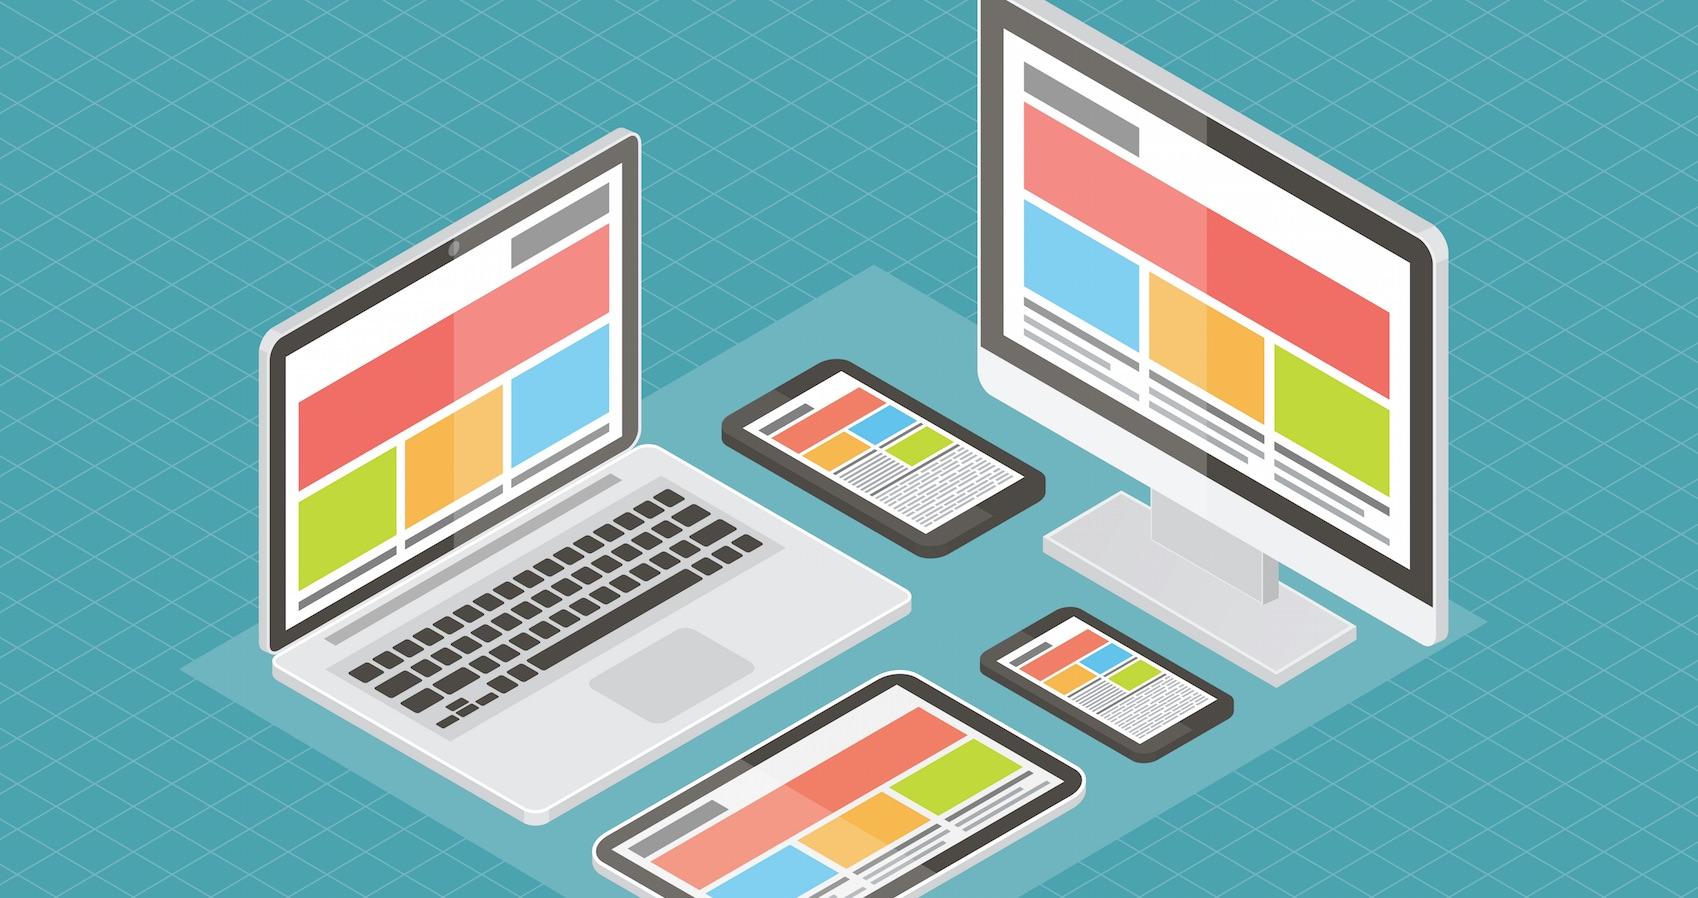 How to Run a Successful Web Design Business